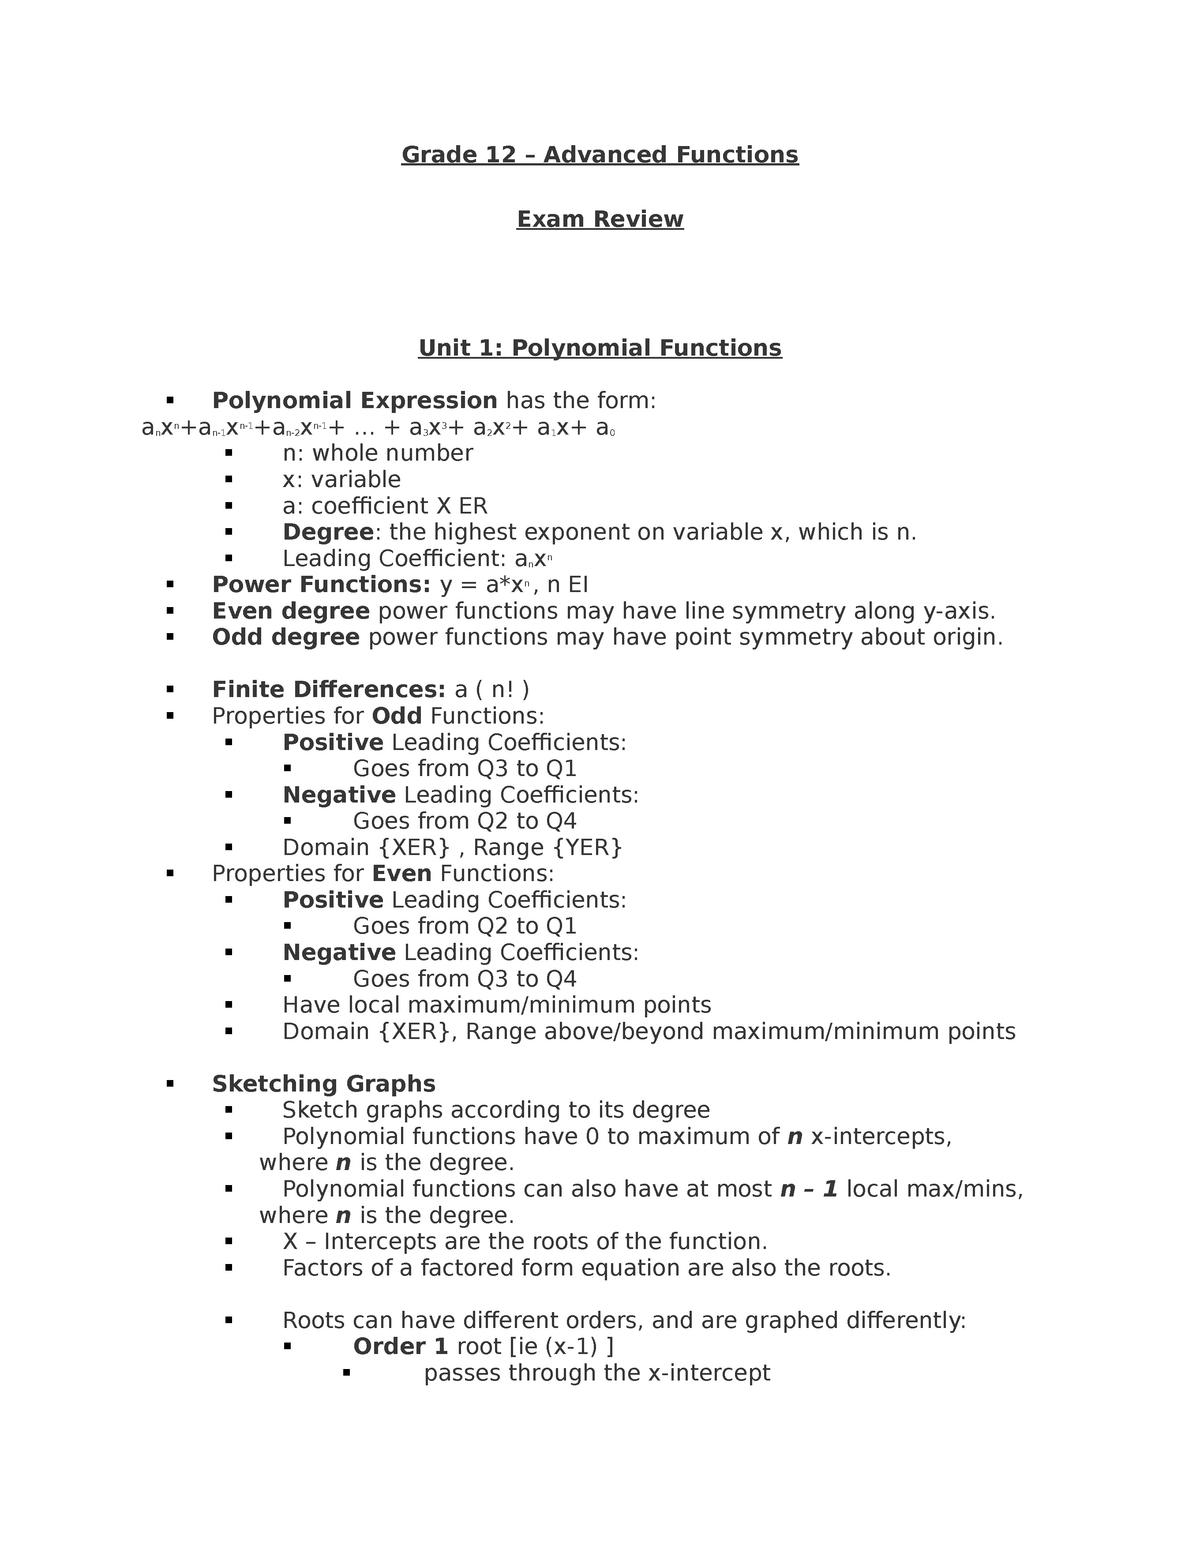 Advanced Functions Exam Review - MATH 1P67 - Brocku - StuDocu